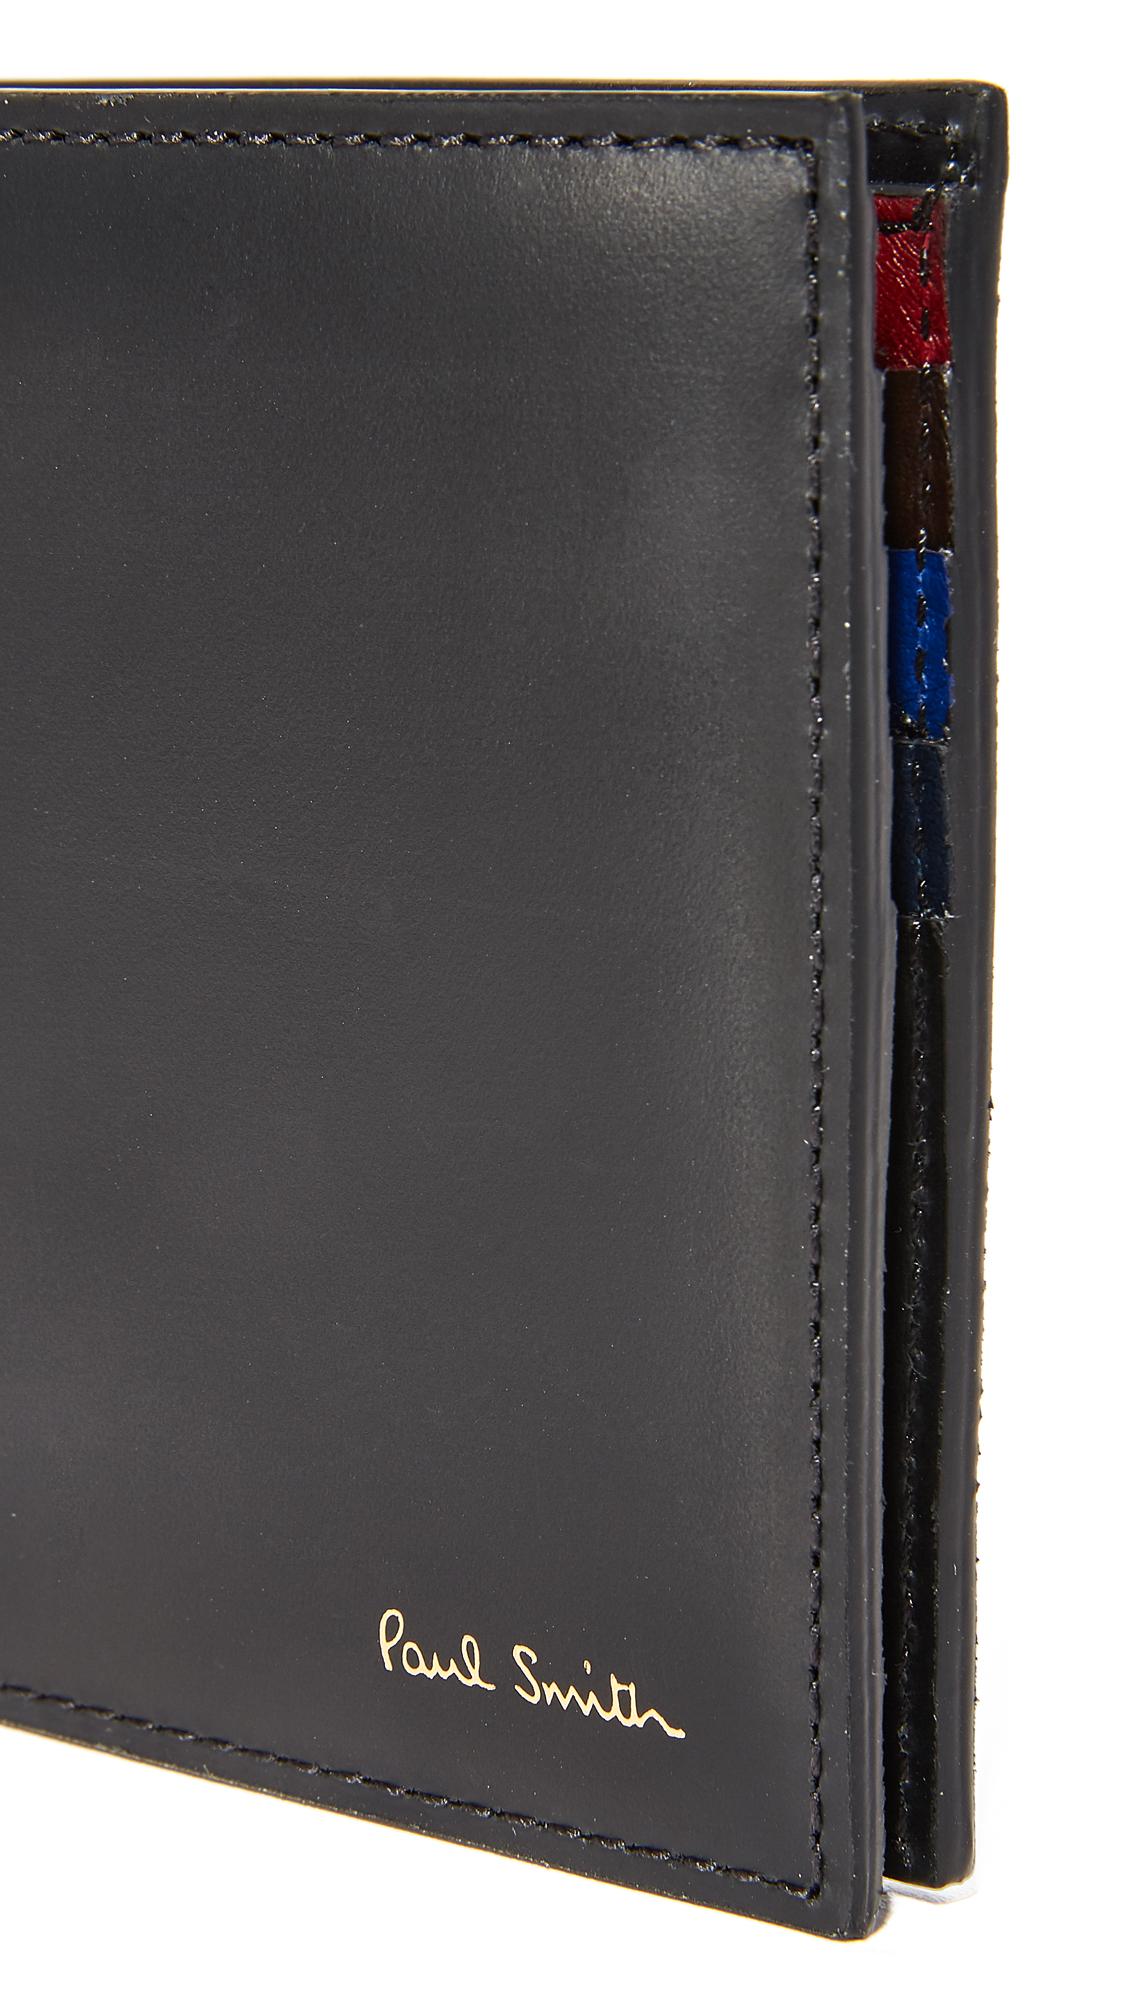 PAUL SMITH Interior Color Band Billfold Wallet